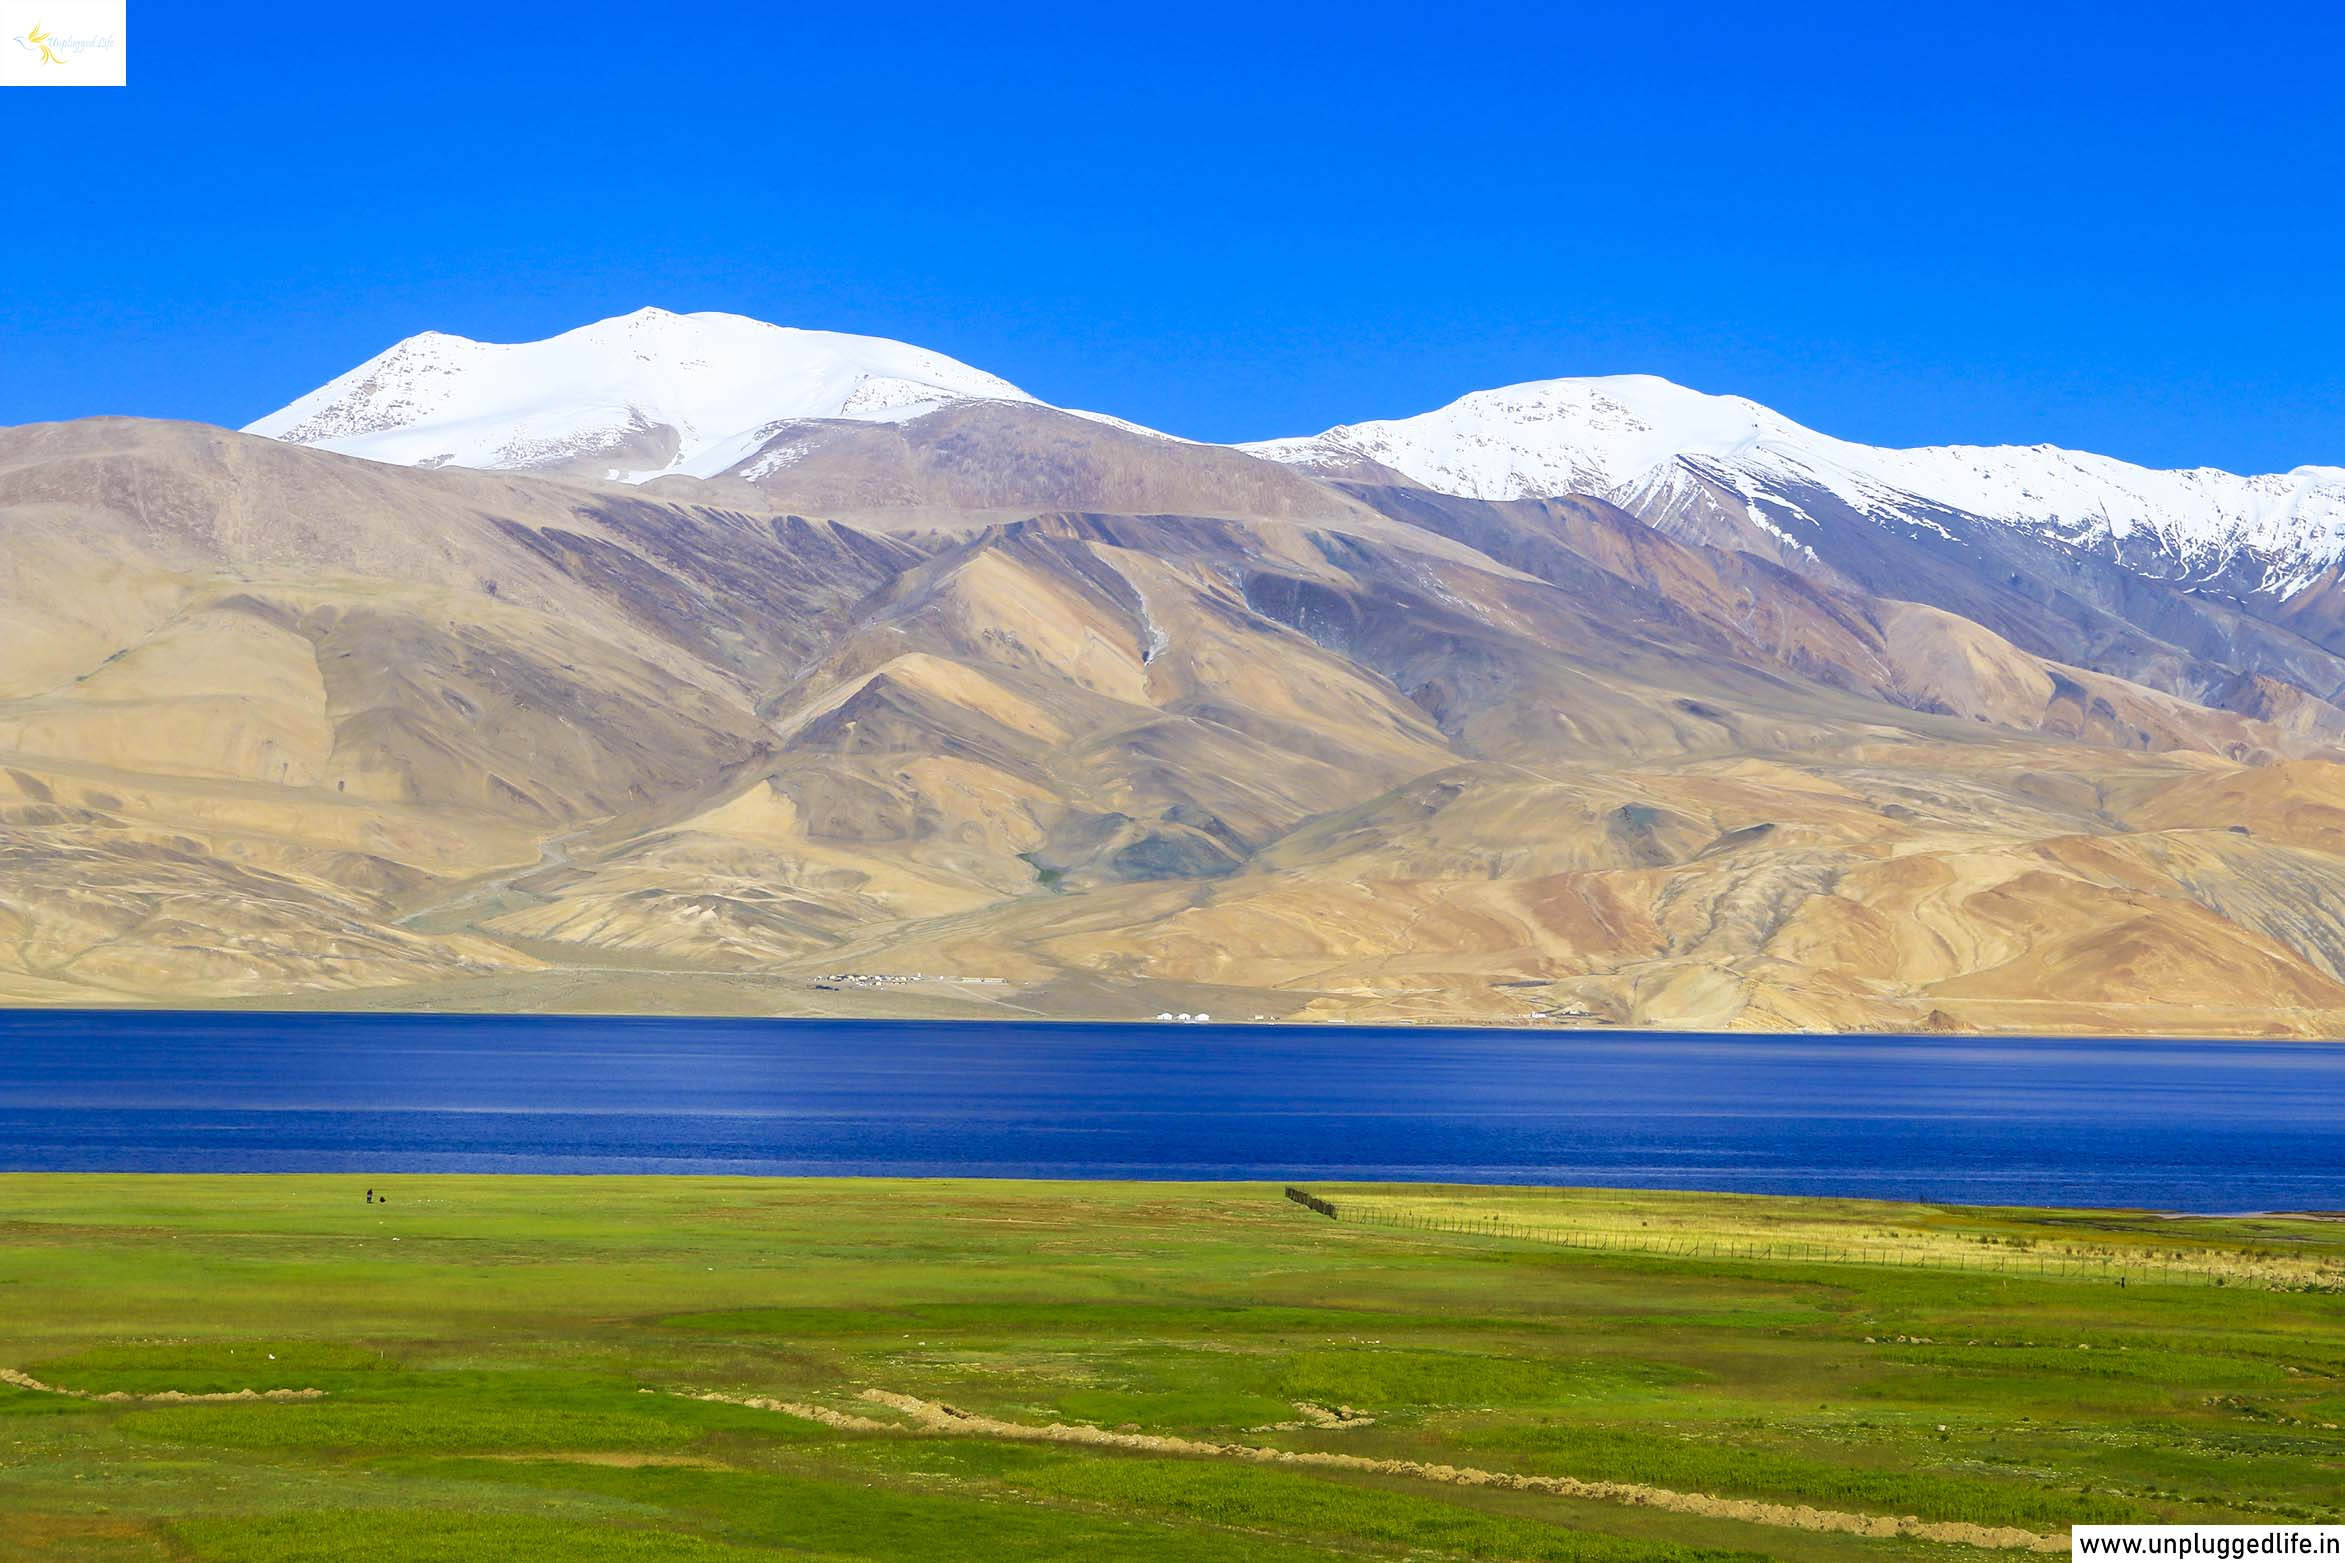 Unplugged Life, Himalayas, Ladakh, Leh View, View of Ladakh, Mountain View, Leh Ladakh Sightseeing Tour, Leh Ladakh Package, Book Ladakh Trip, Top Places in Ladakh, Sightseeing in Leh-Ladakh, Ladakh View, Leh Ladakh View, Landscape in Ladakh, Tso Moriri Lake, Blue Lake, Highest Lakes in India, high altitude lake, salt water lakes, lakes in Ladakh